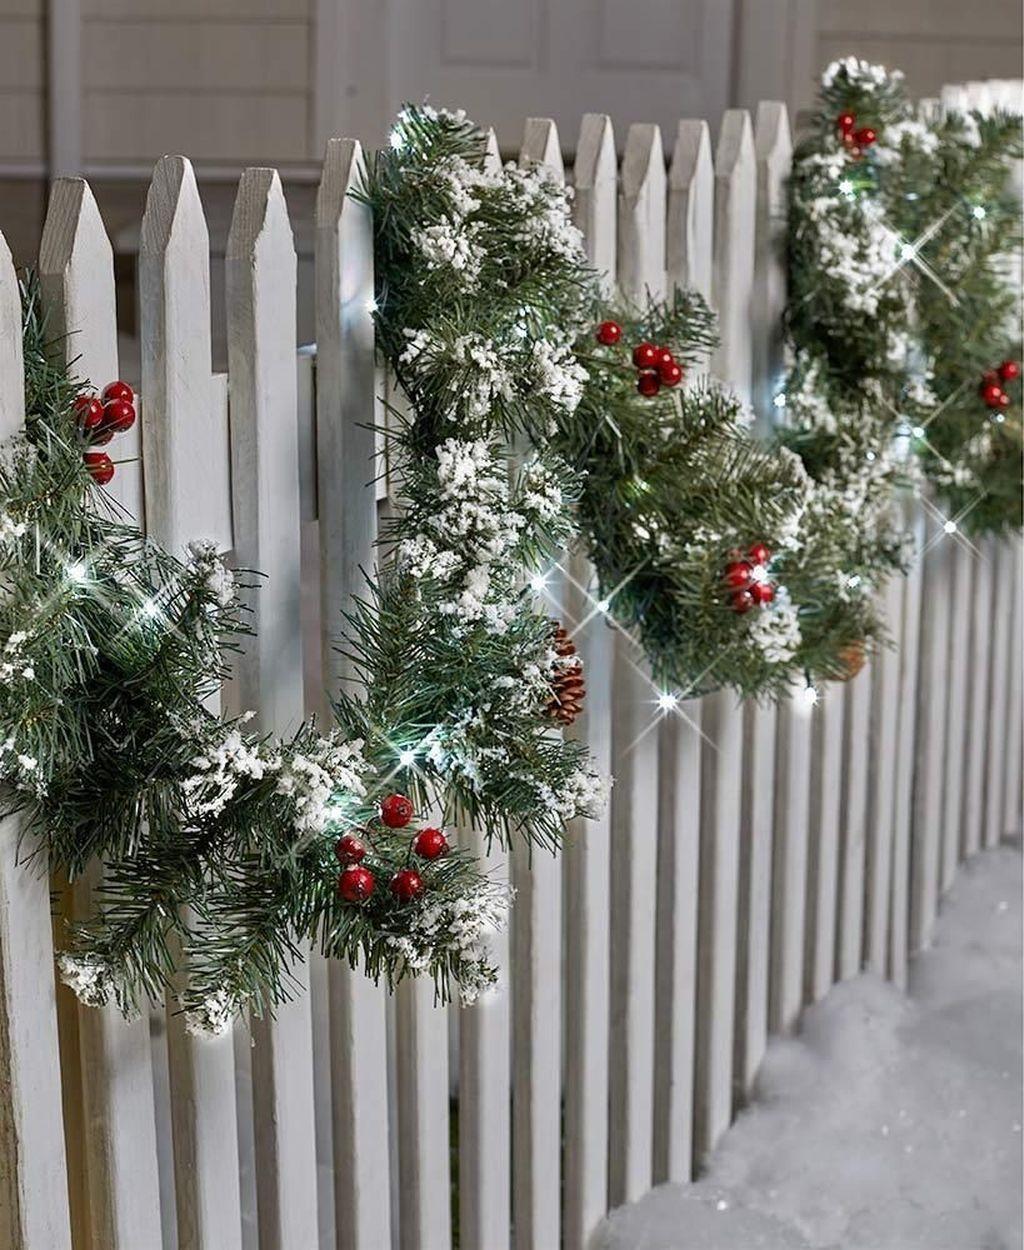 41 Affordable Winter Christmas Decorations Ideas Addicfashion Holiday Decor Christmas Outdoor Christmas Christmas Lights